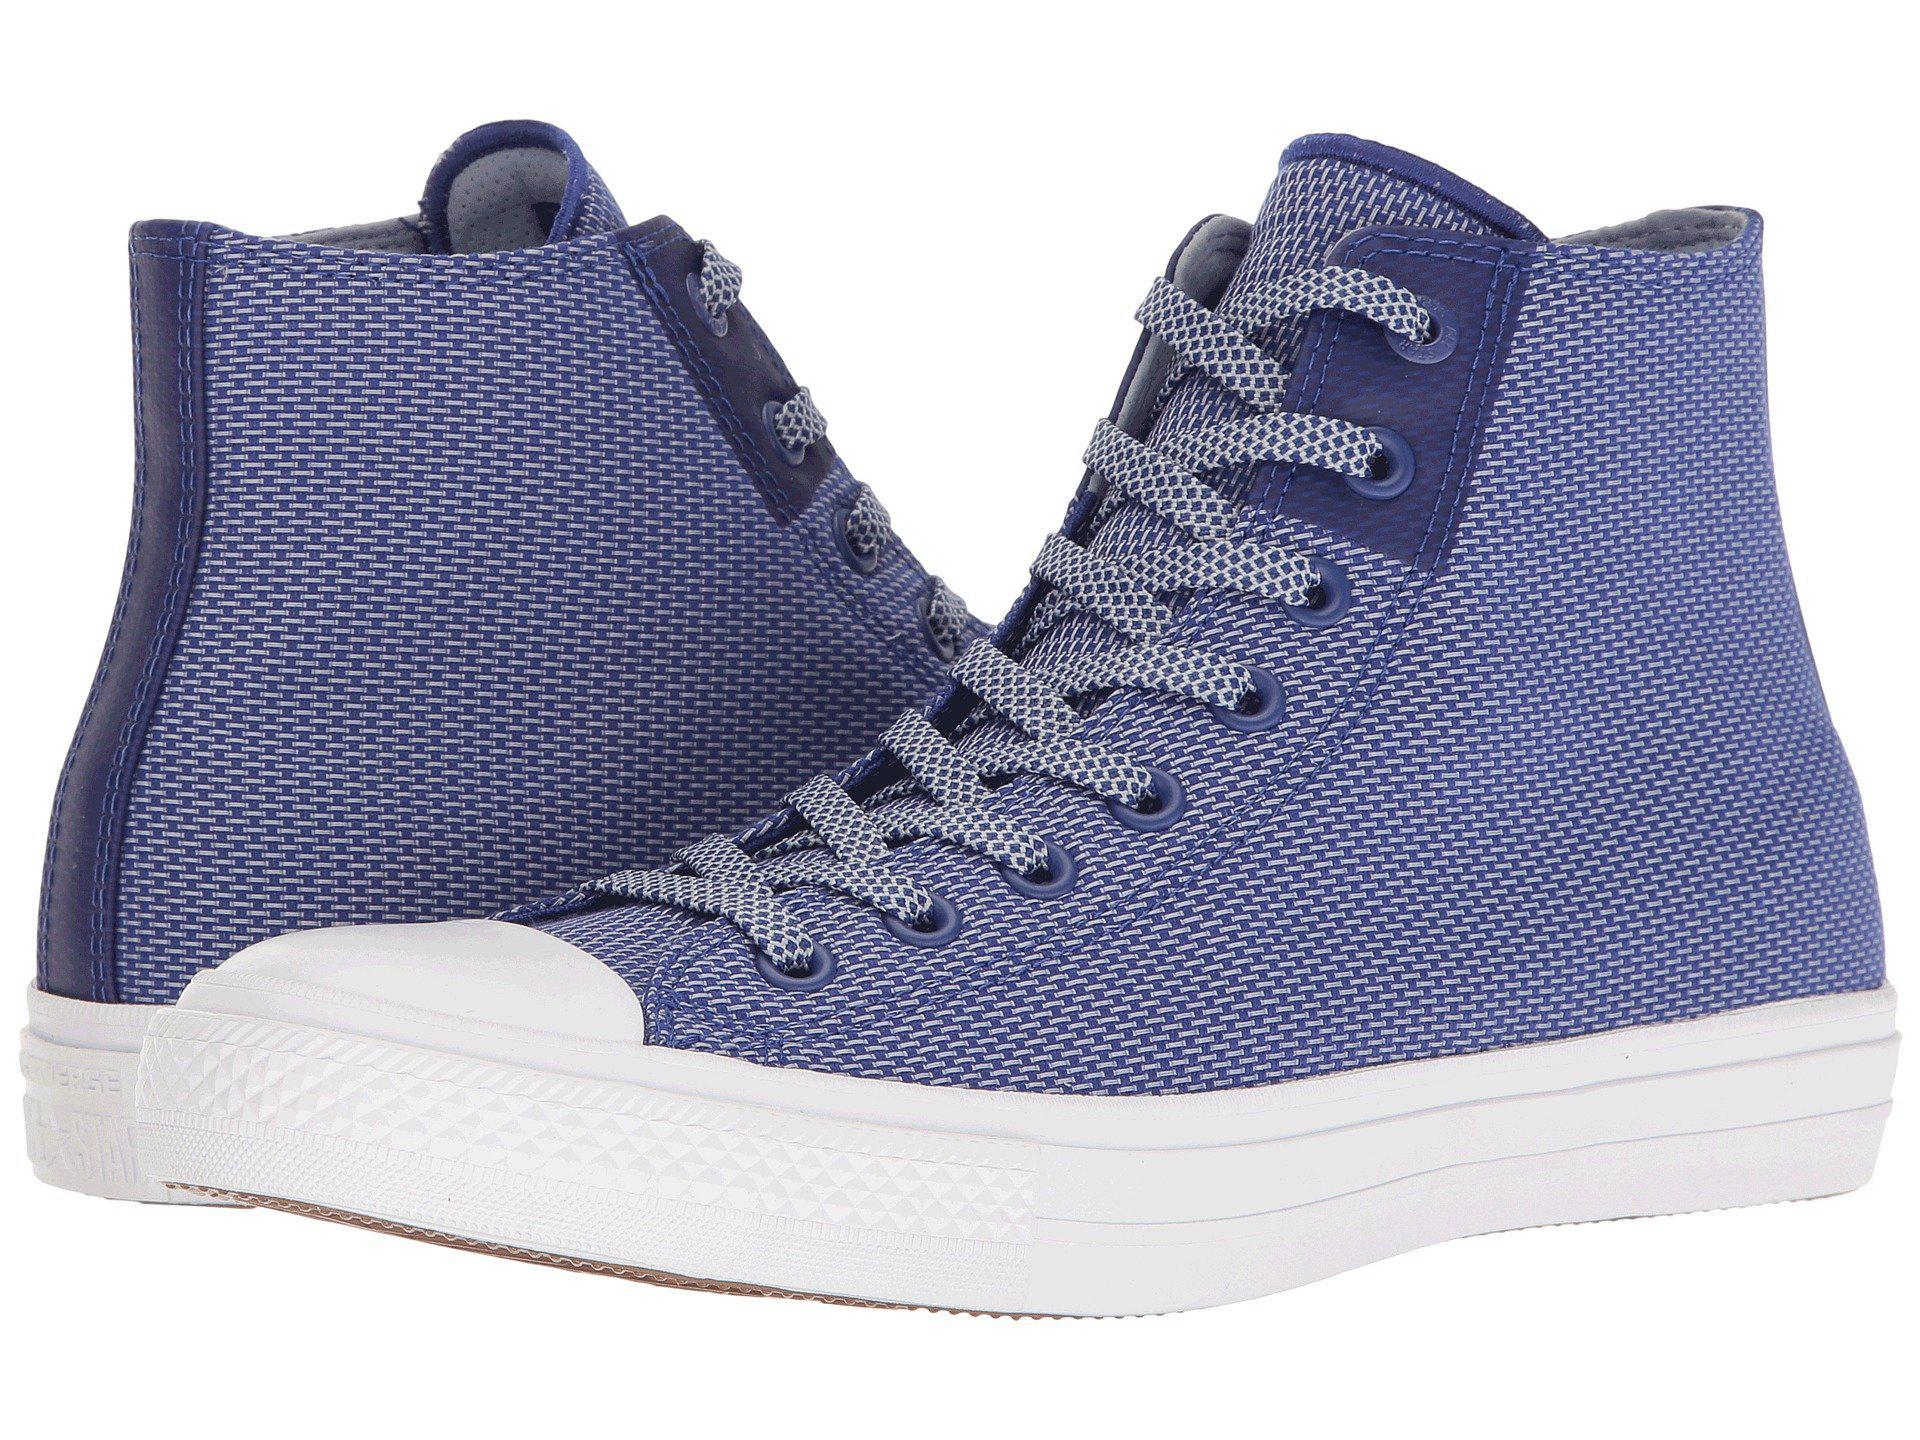 2b6e1d89d566 Lyst - Converse Chuck Taylor® All Star® Chuck Ii Woven Hi in Blue ...